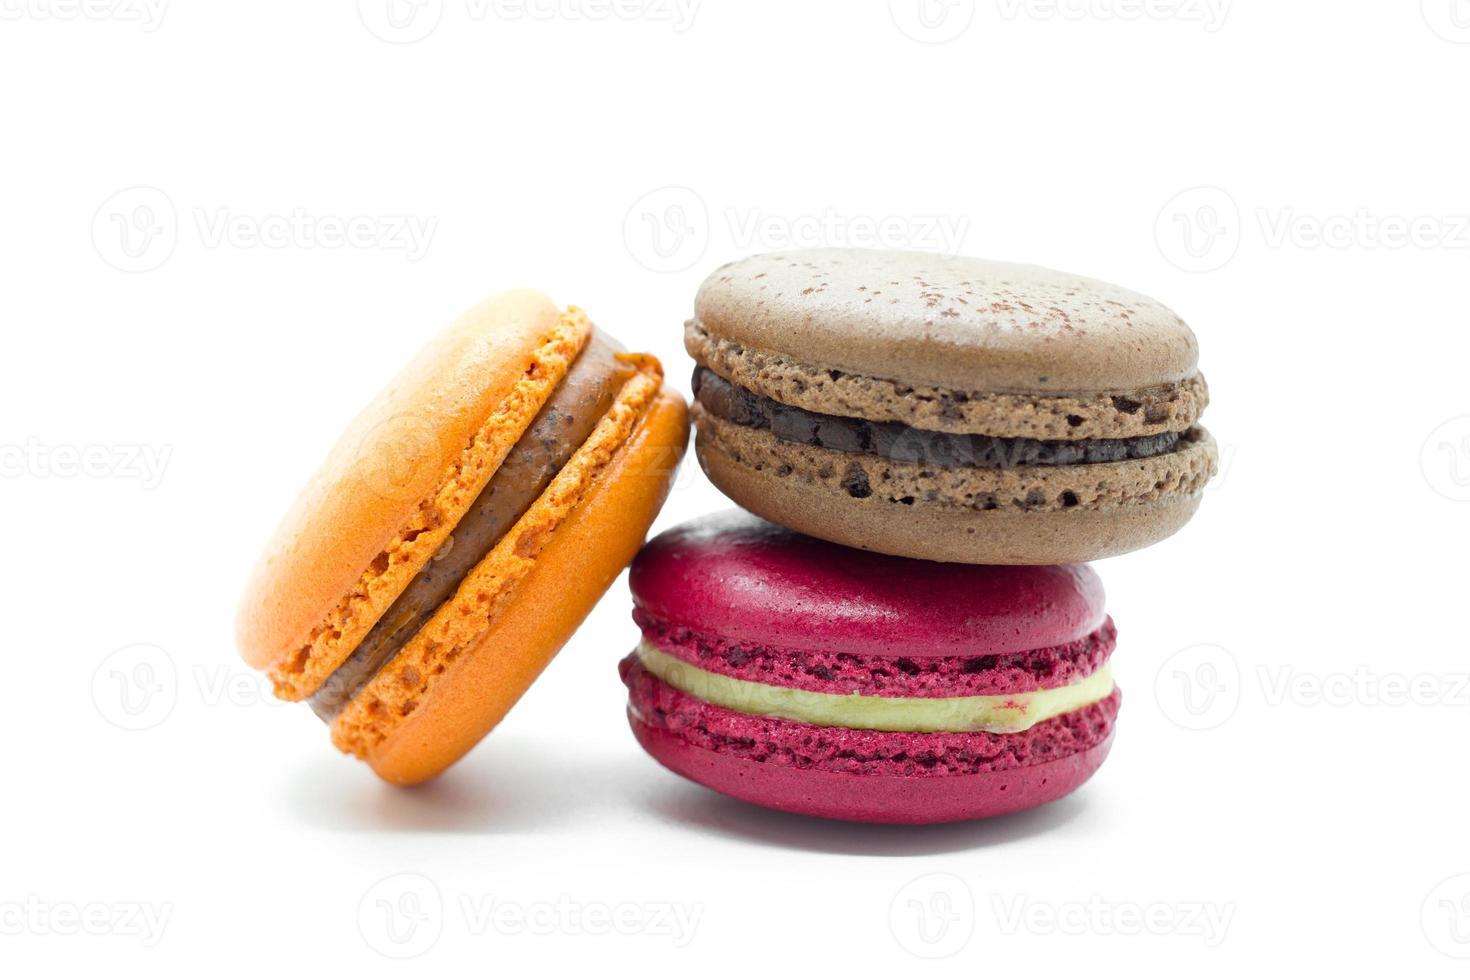 macarons franceses coloridos. foto